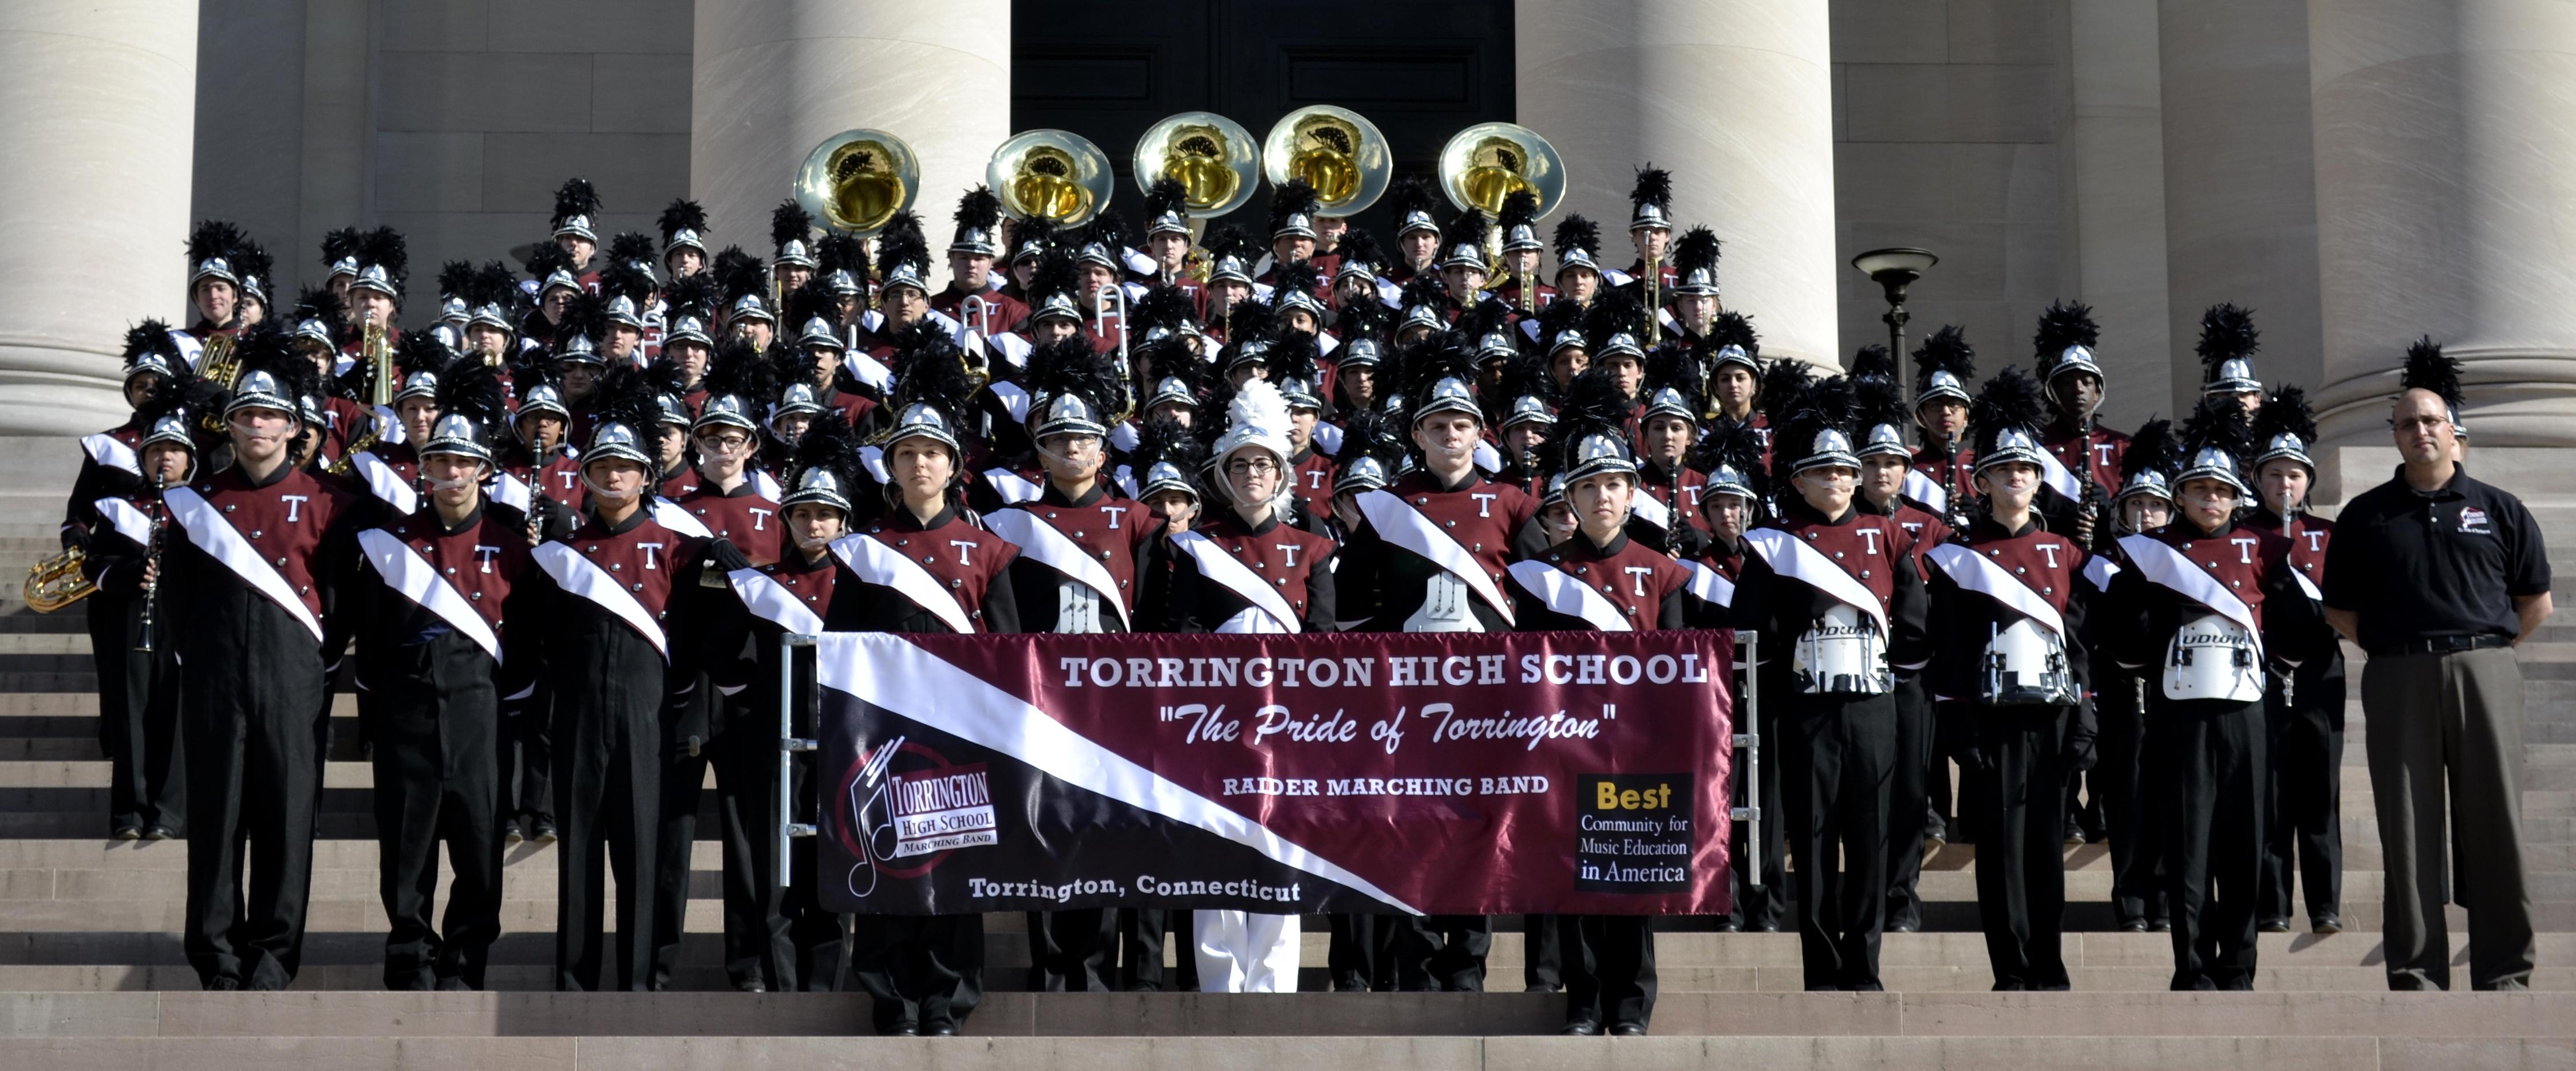 Torrington High School Marching